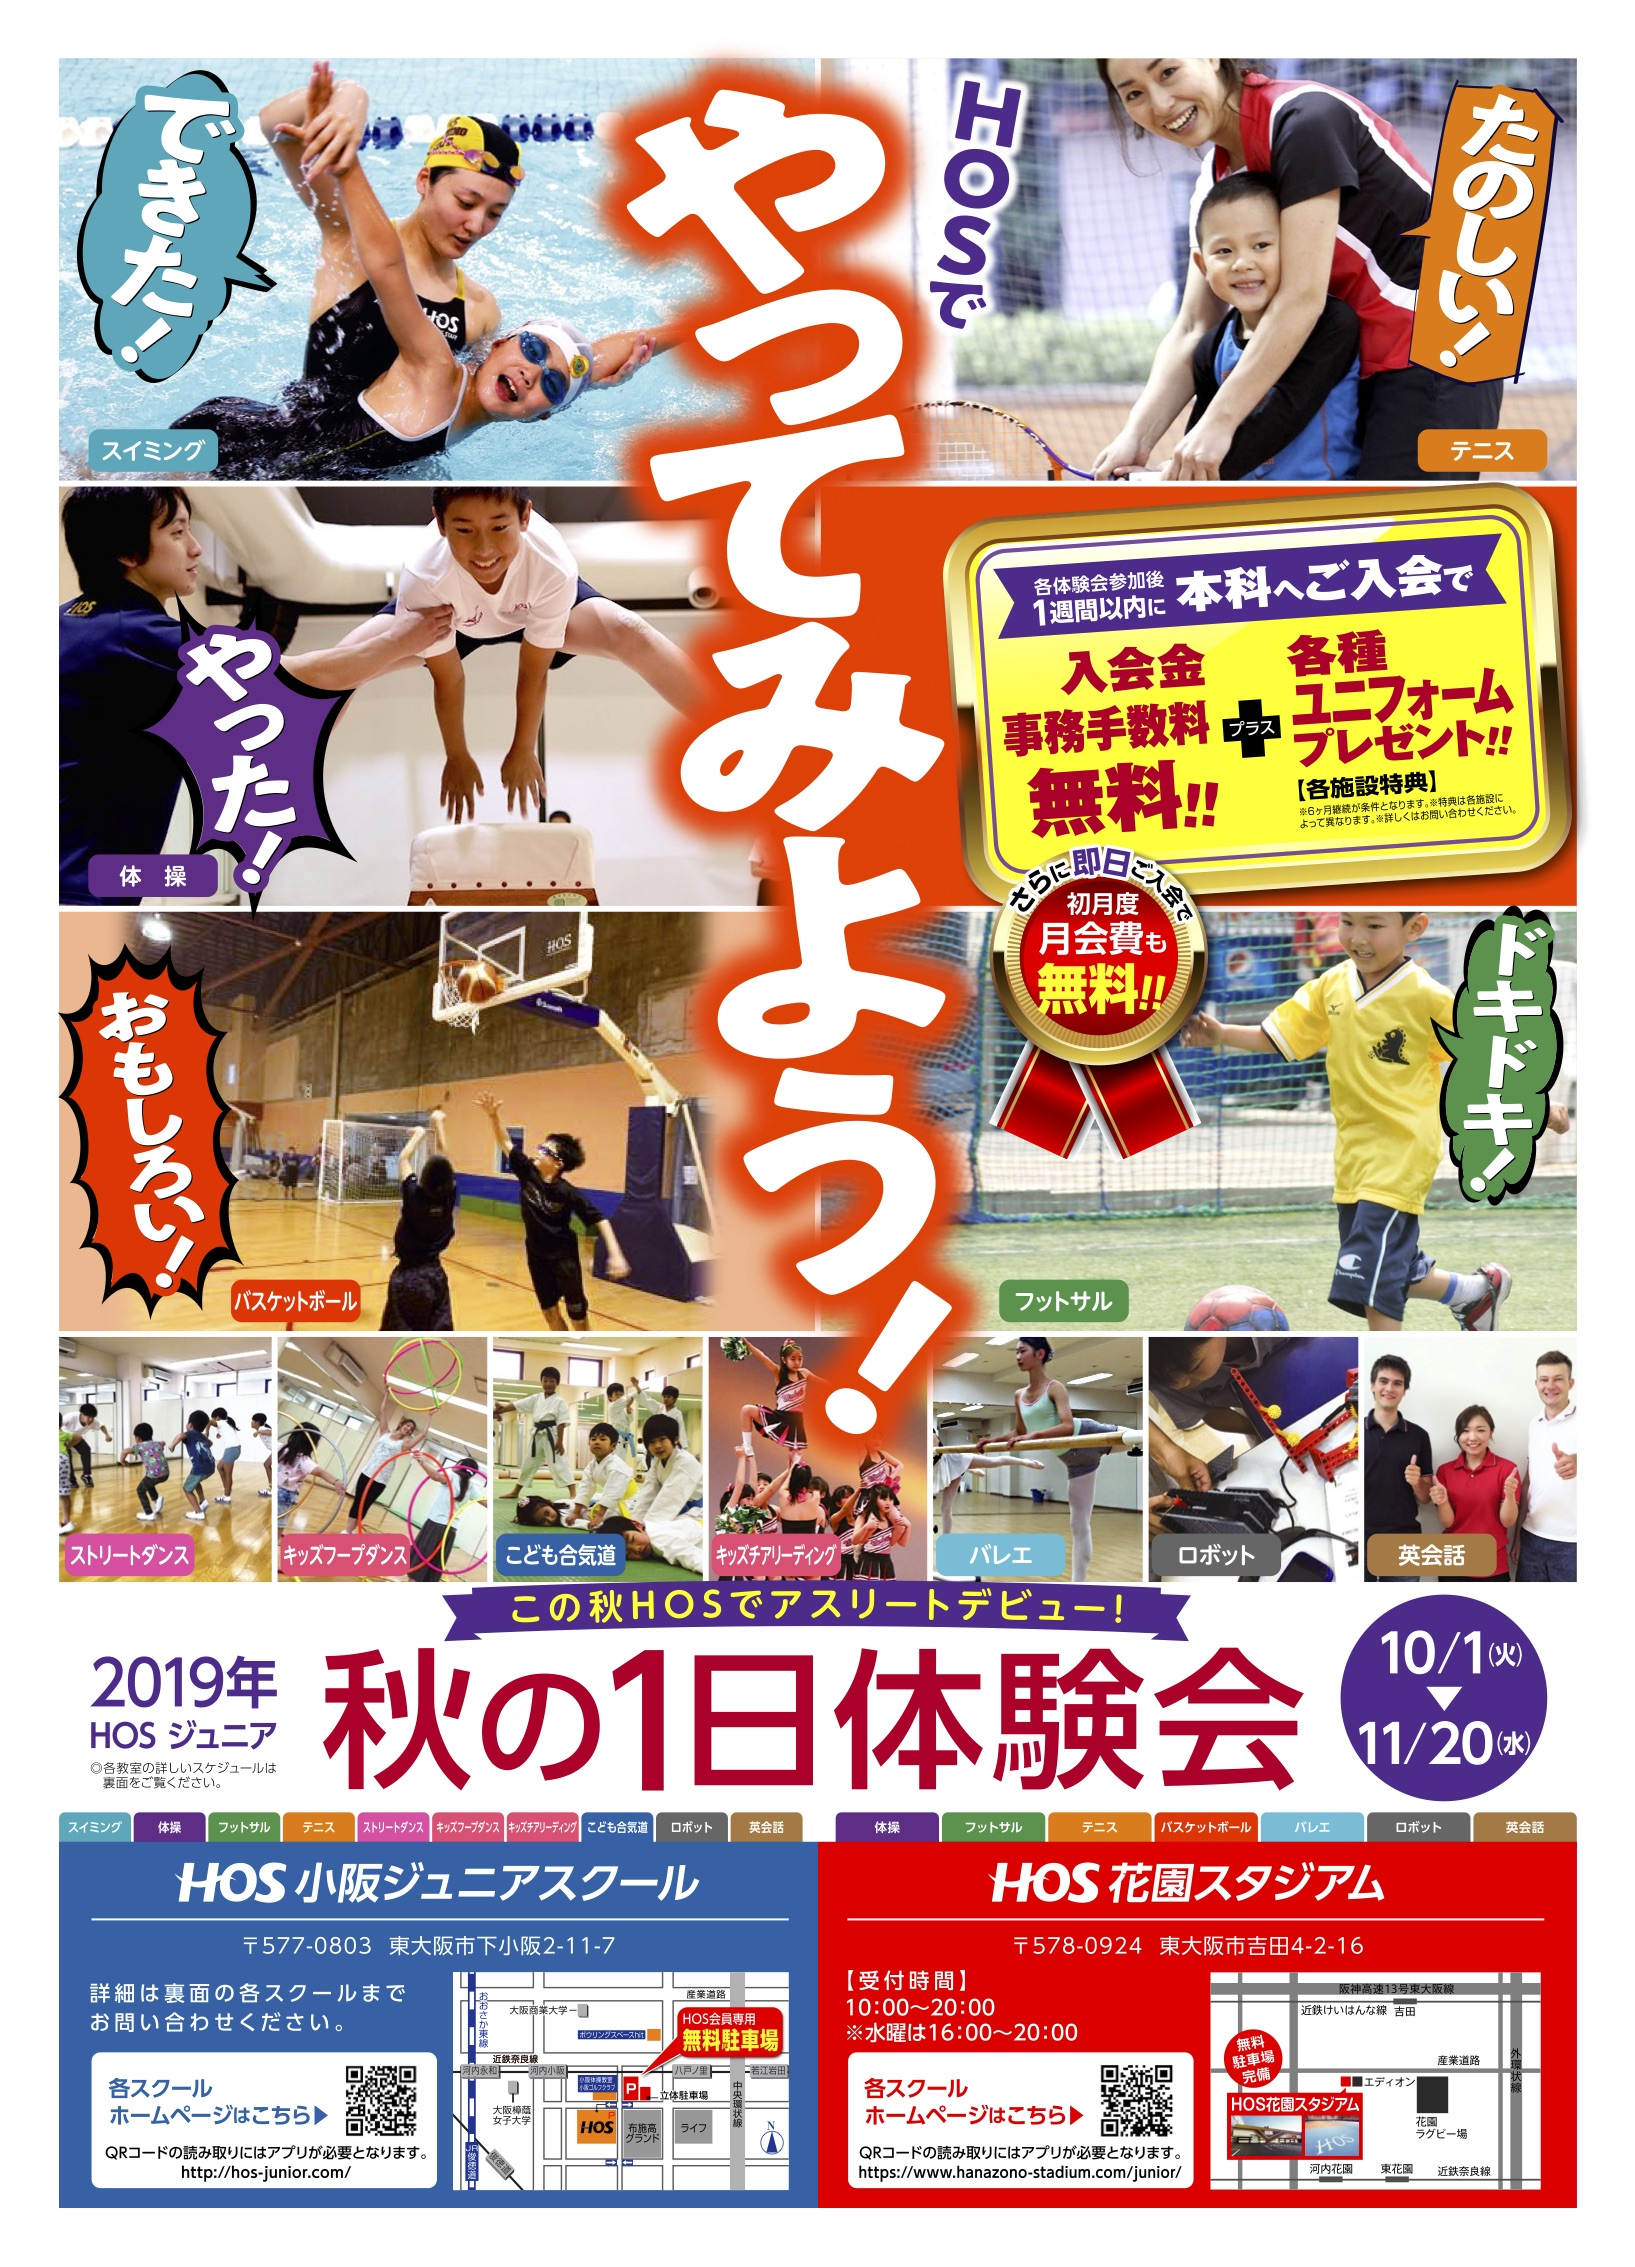 kosaka-201910-onday-omote